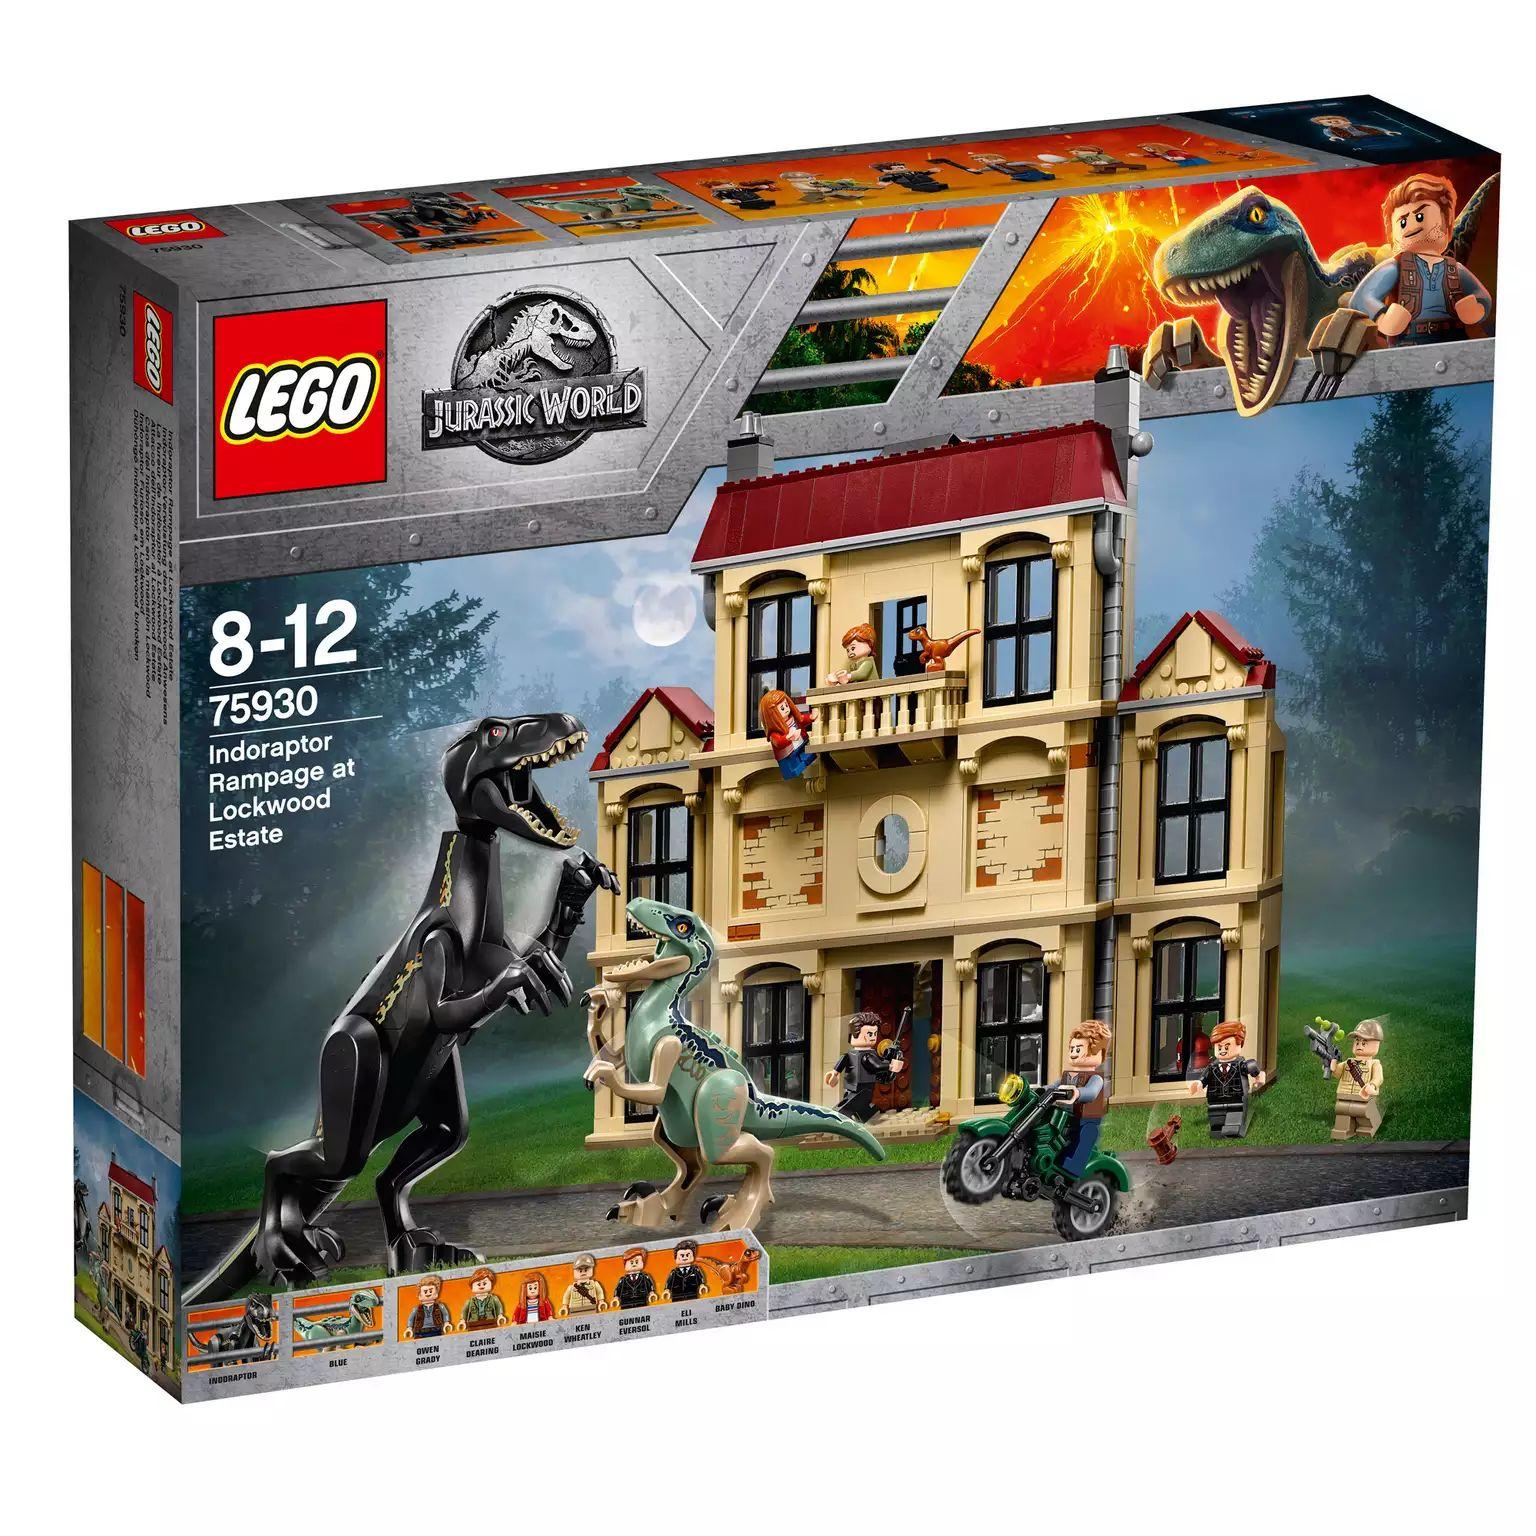 LEGO - 'Jurassic World - Indoraptor Rampage at Lockwood Estate' set - 75930 - £84 at Debenhams